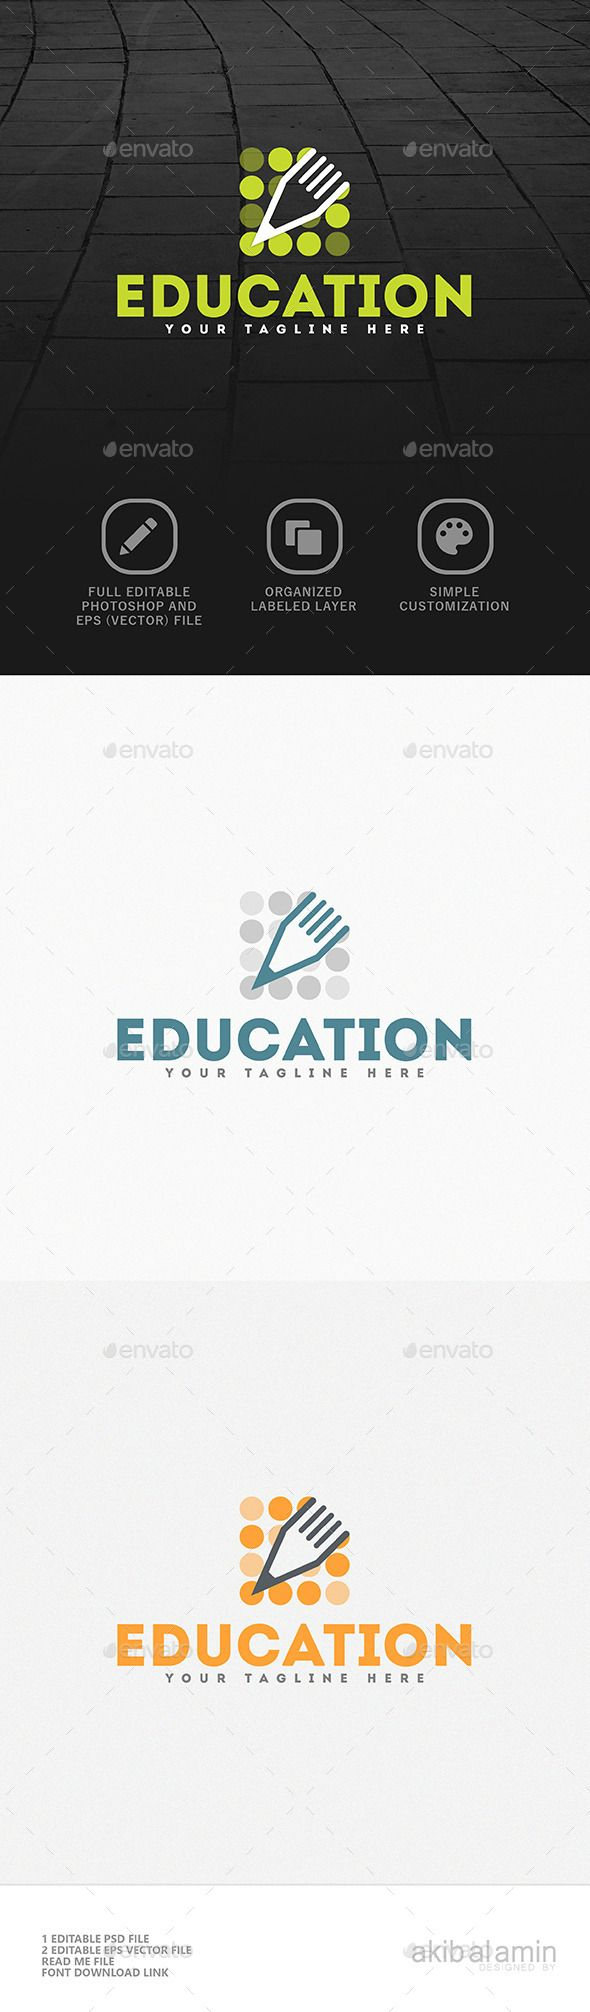 Educational  V1 - Logo Design Template Vector #logotype Download it here: http://graphicriver.net/item/educational-logo-v1/10762472?s_rank=531?ref=nexion